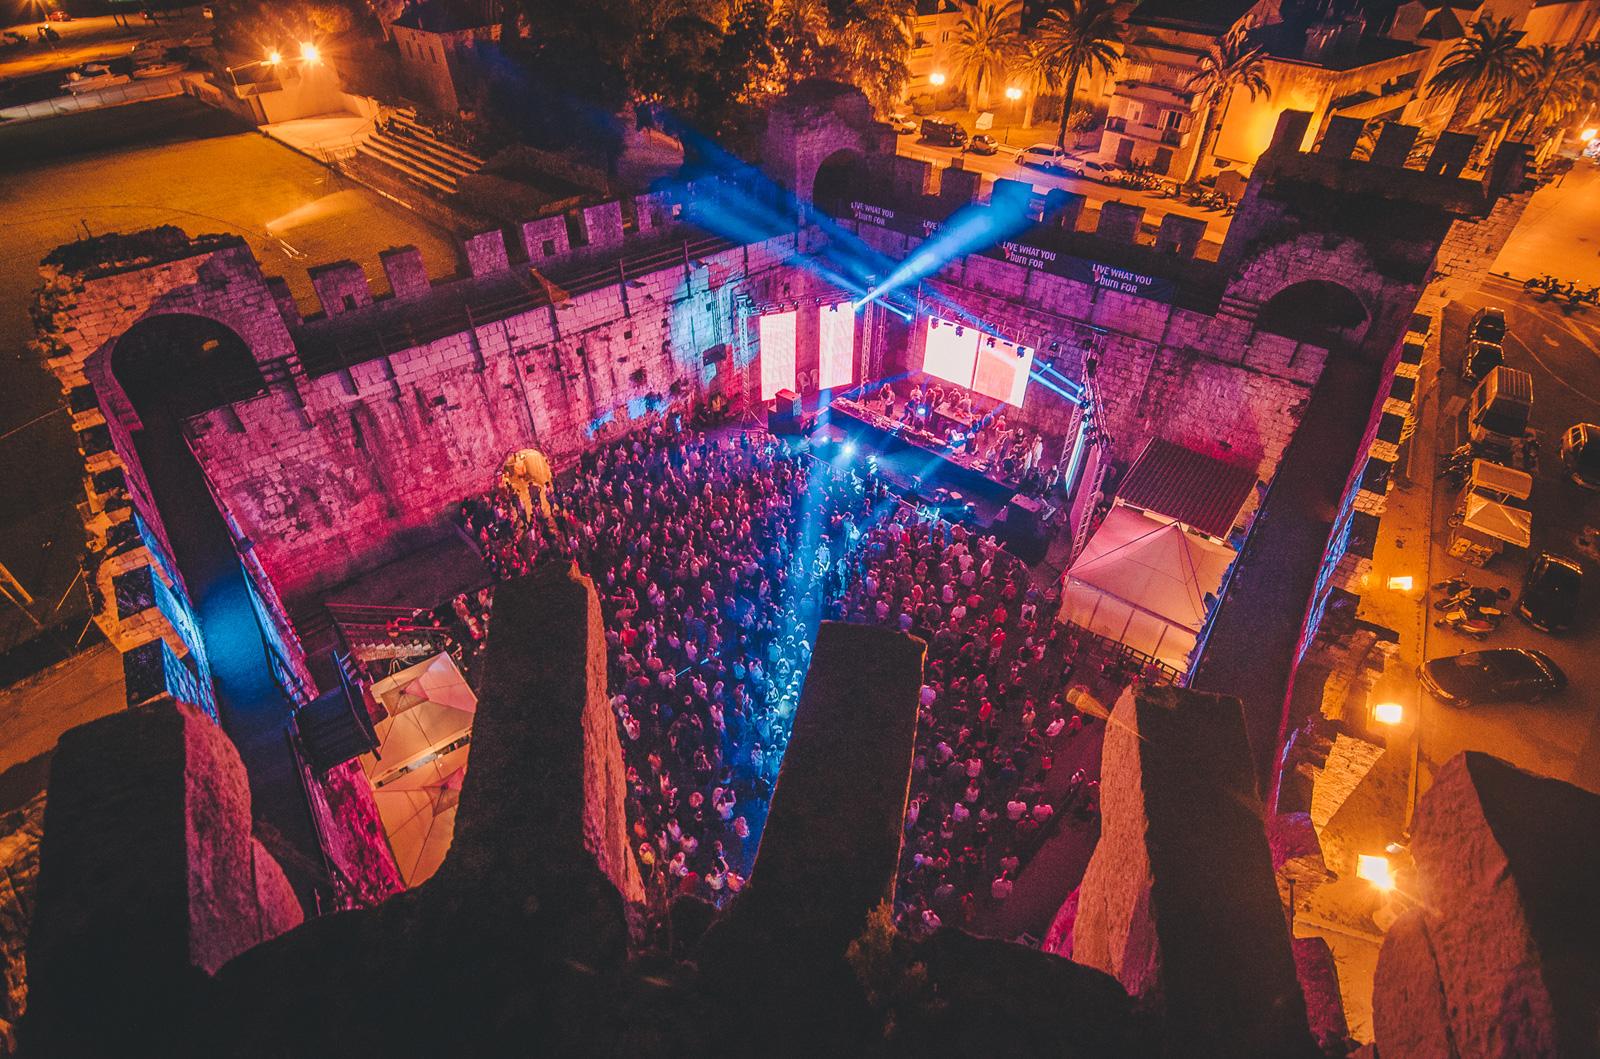 Moondance festival is held inside a 15th-century castle